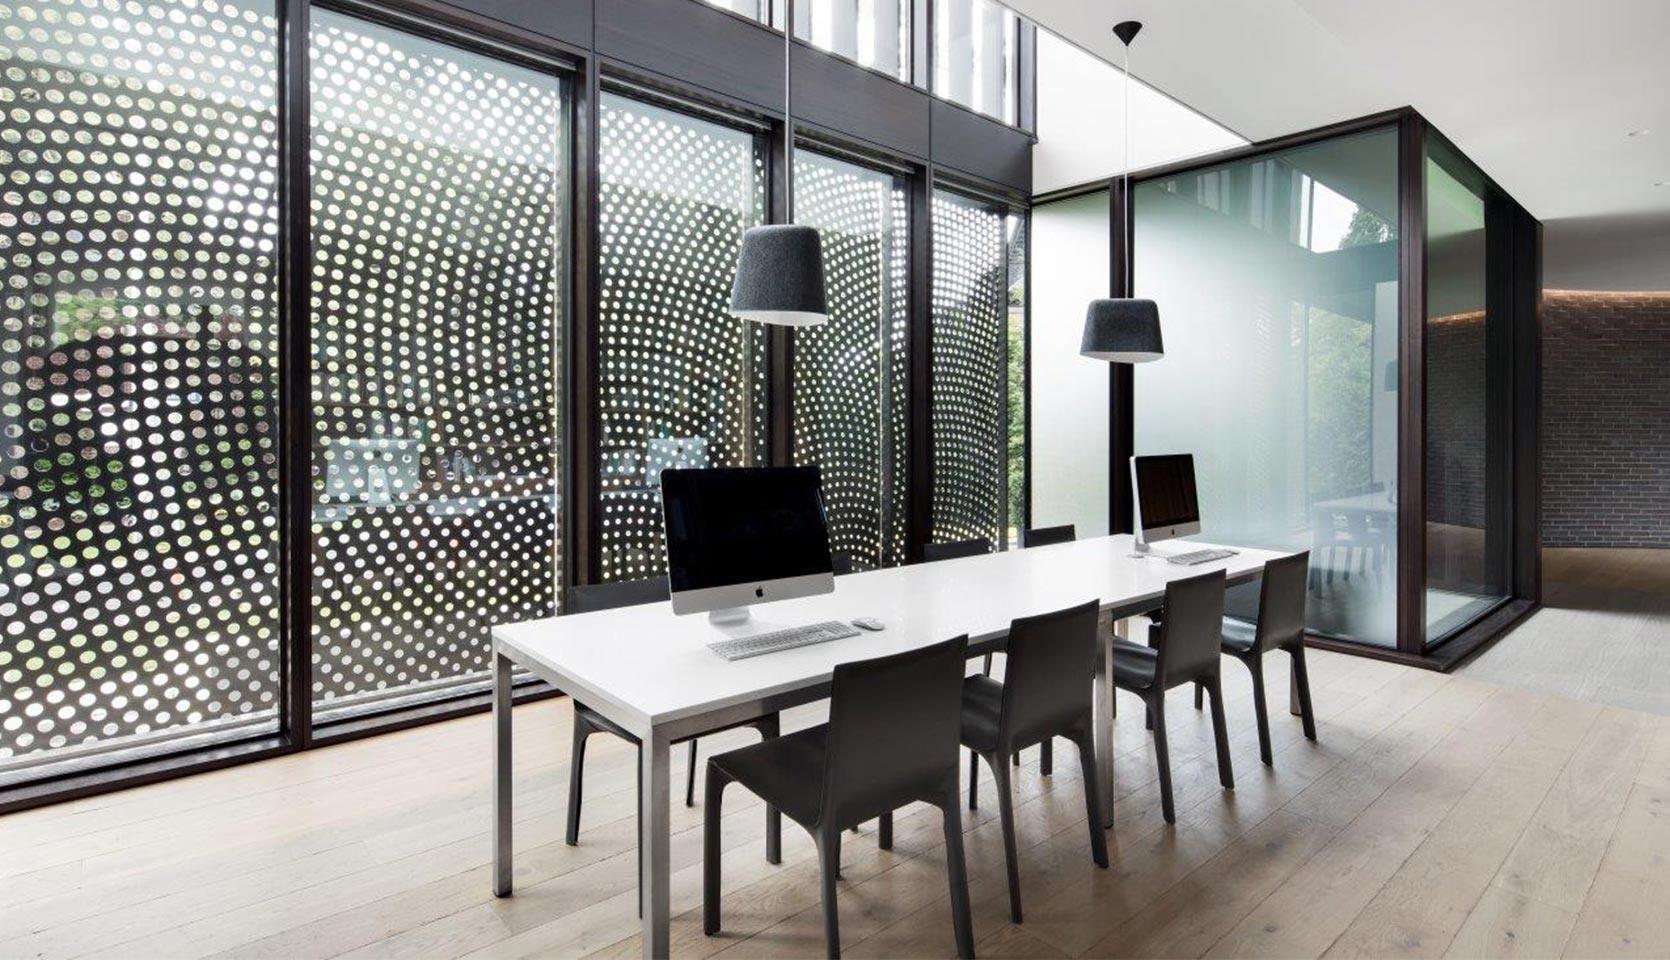 severnwoods-modern-rosedale-house-office-space